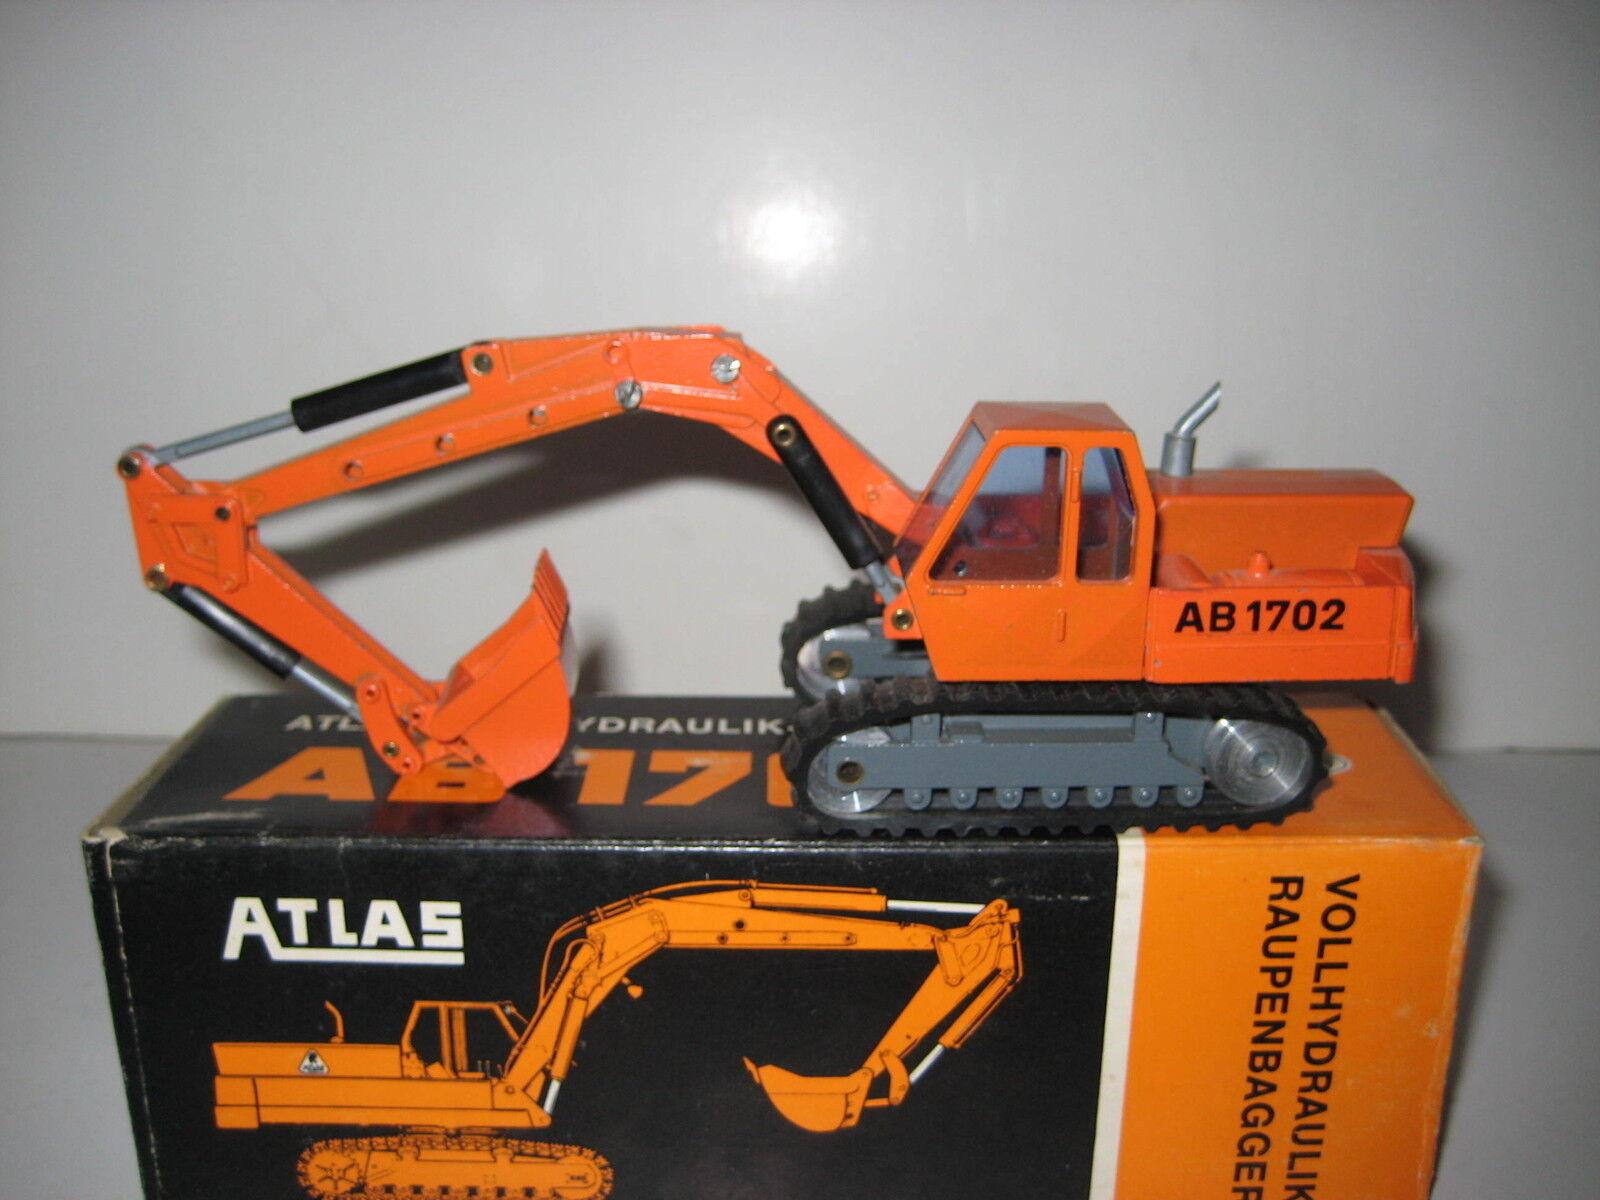 Atlas À PARTIR DE 1702 Excavateurs tieflöffel  104.1 NZG 1 50 neuf dans sa boîte